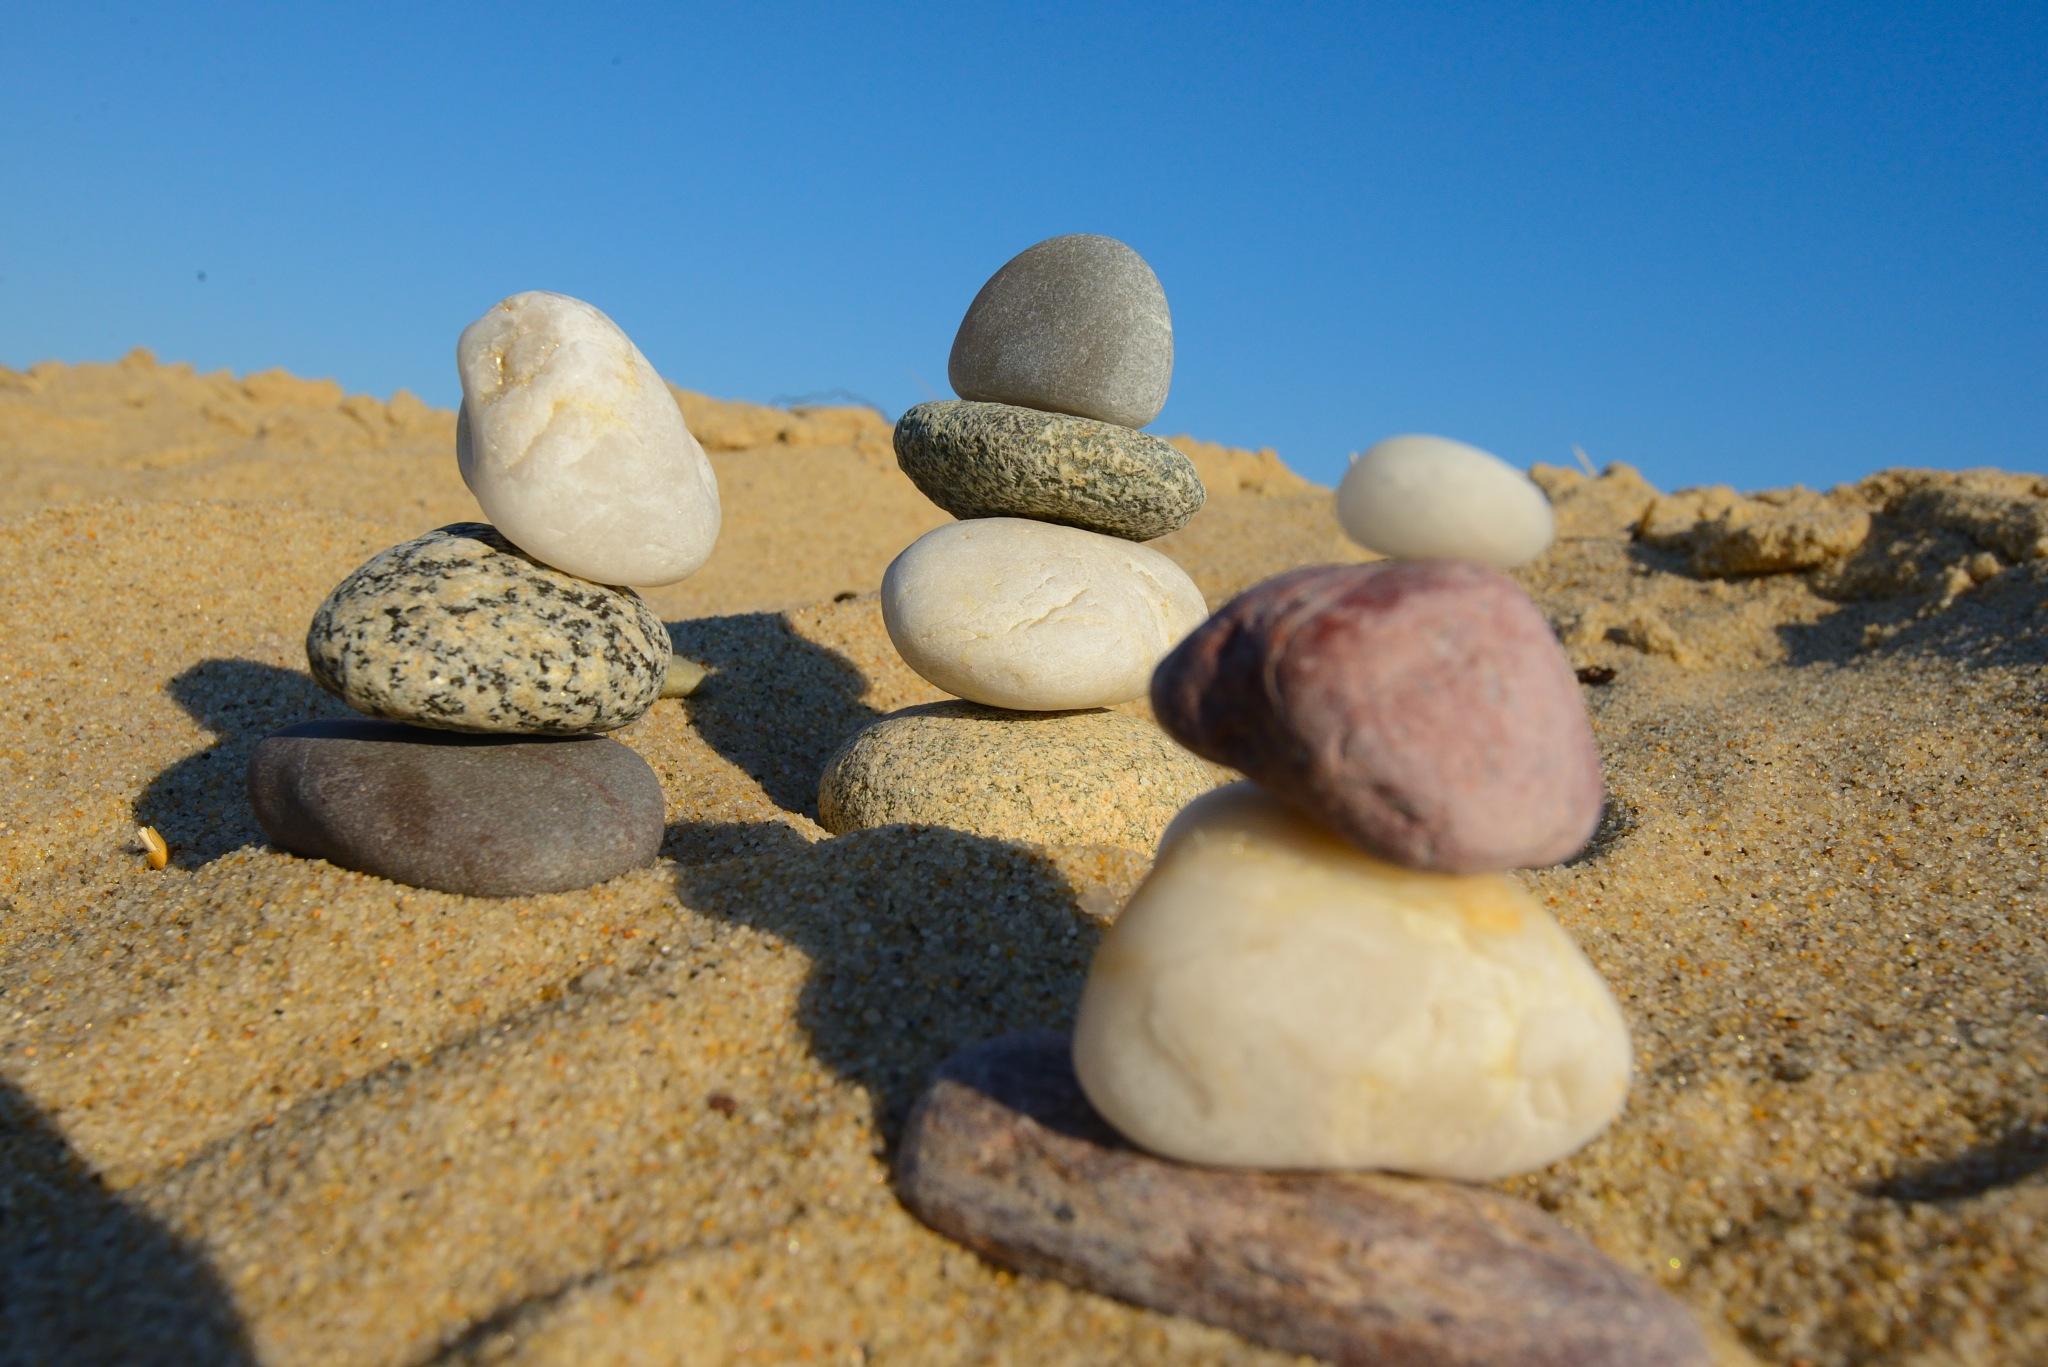 Balanced Pebbles by BillVasyl